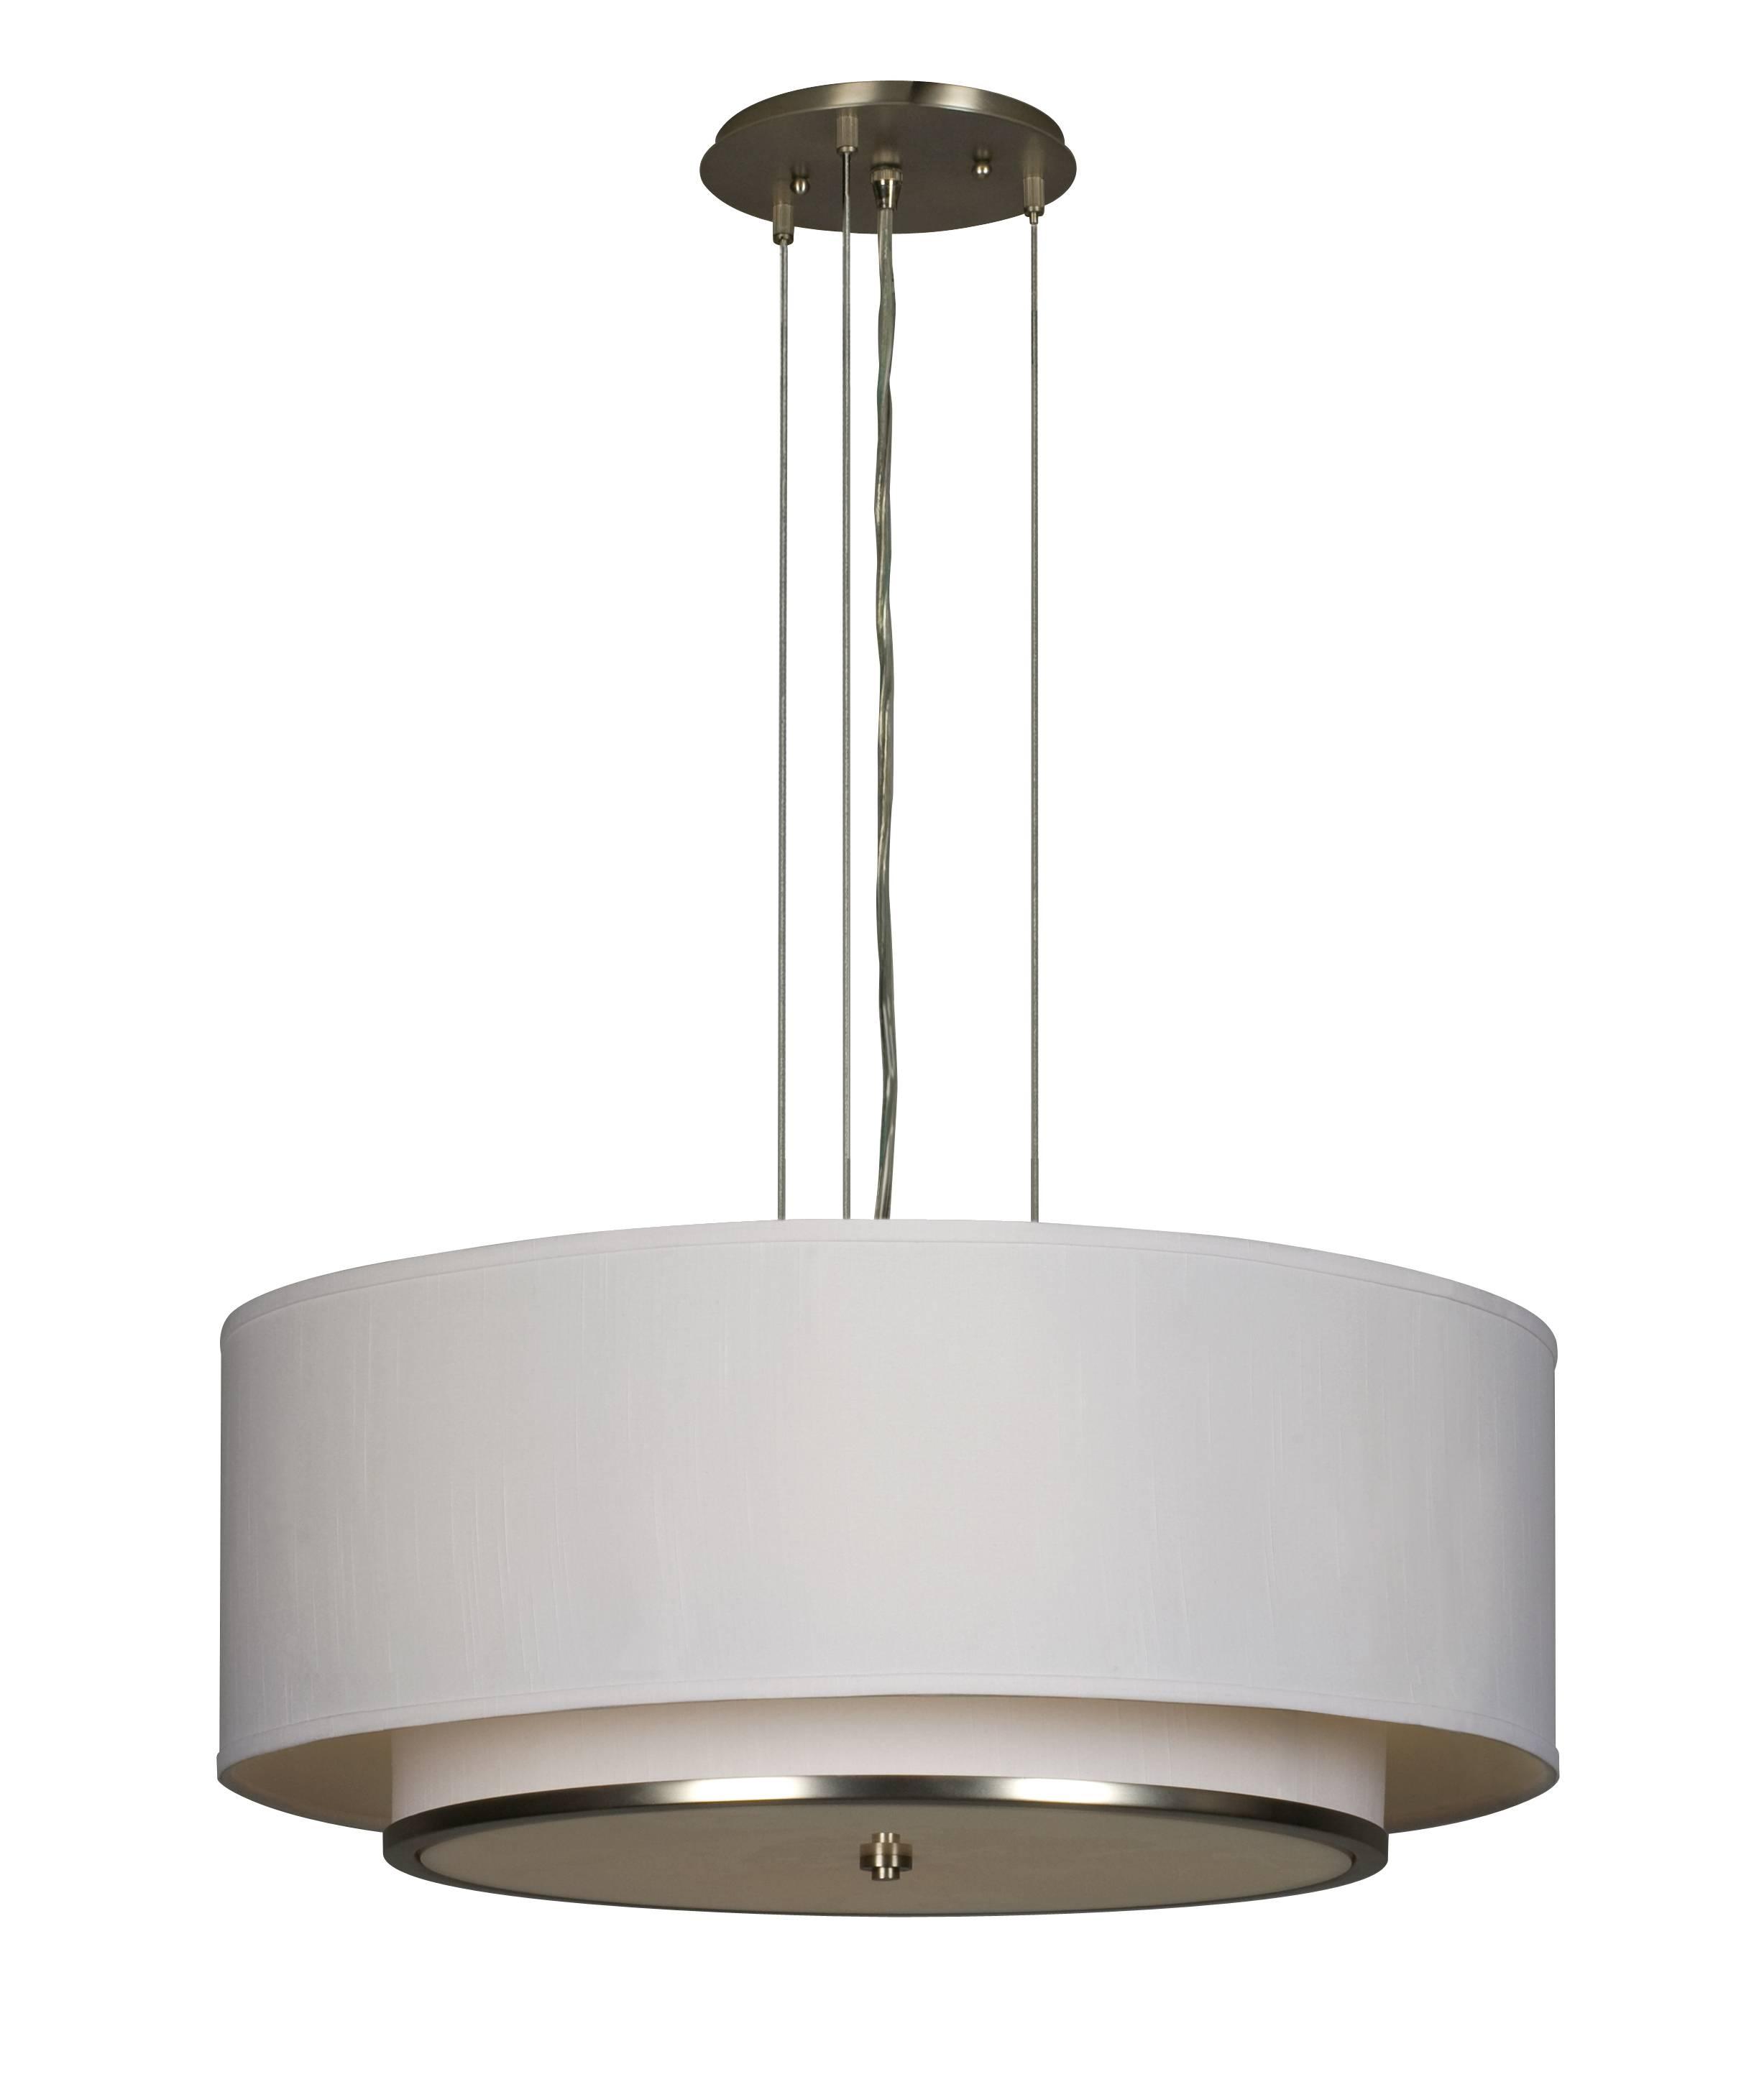 Fixtures Light : Fair Pendant Commercial Fluorescent Light within Commercial Pendant Lights (Image 8 of 15)